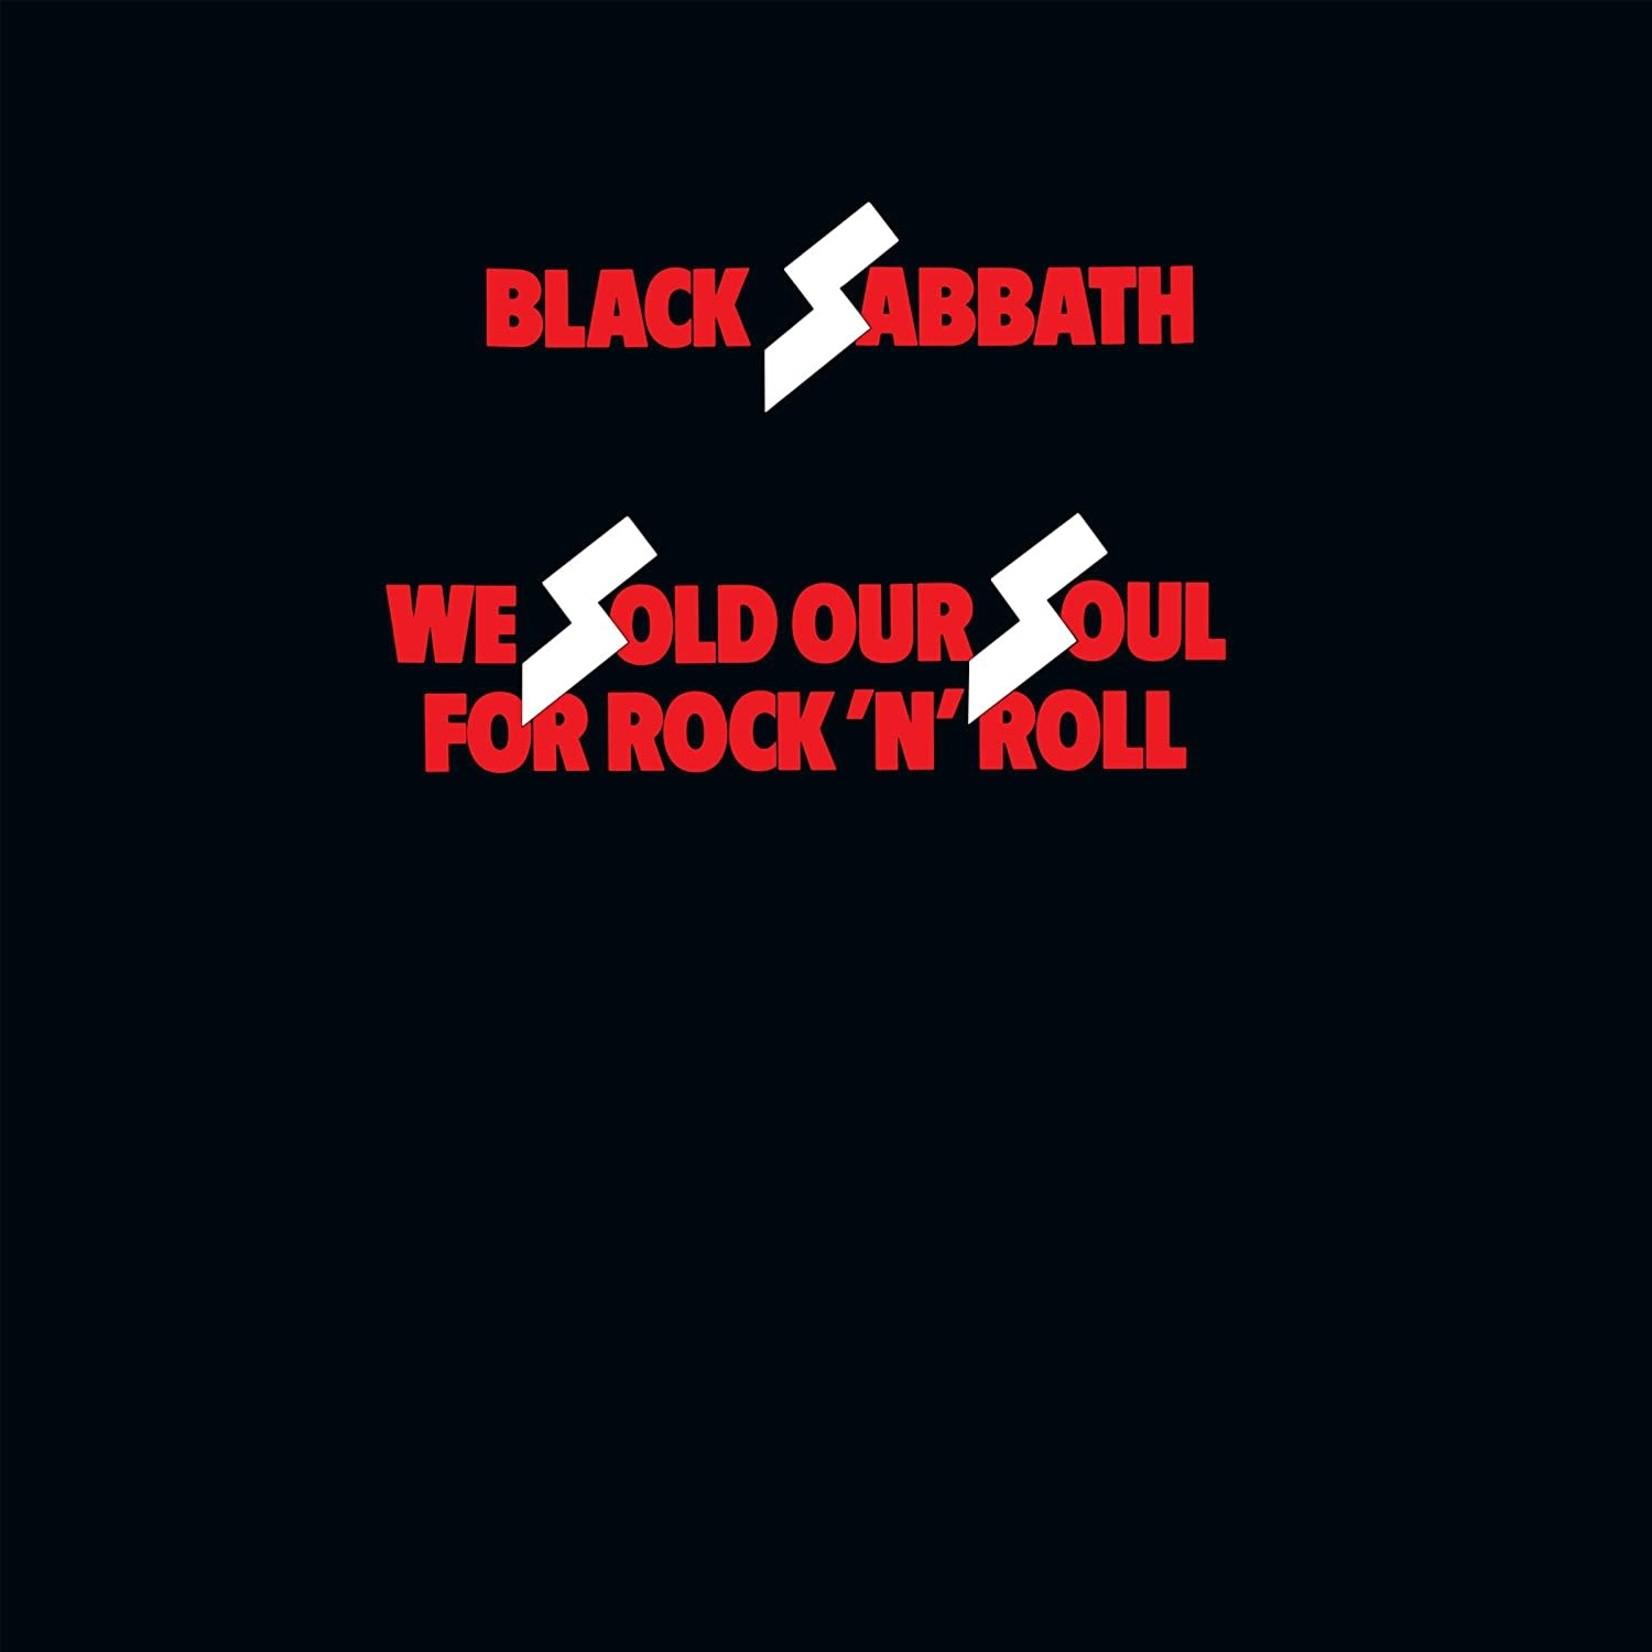 [New] Black Sabbath: We Sold Our Soul For Rock N' Roll (2LP, red vinyl)